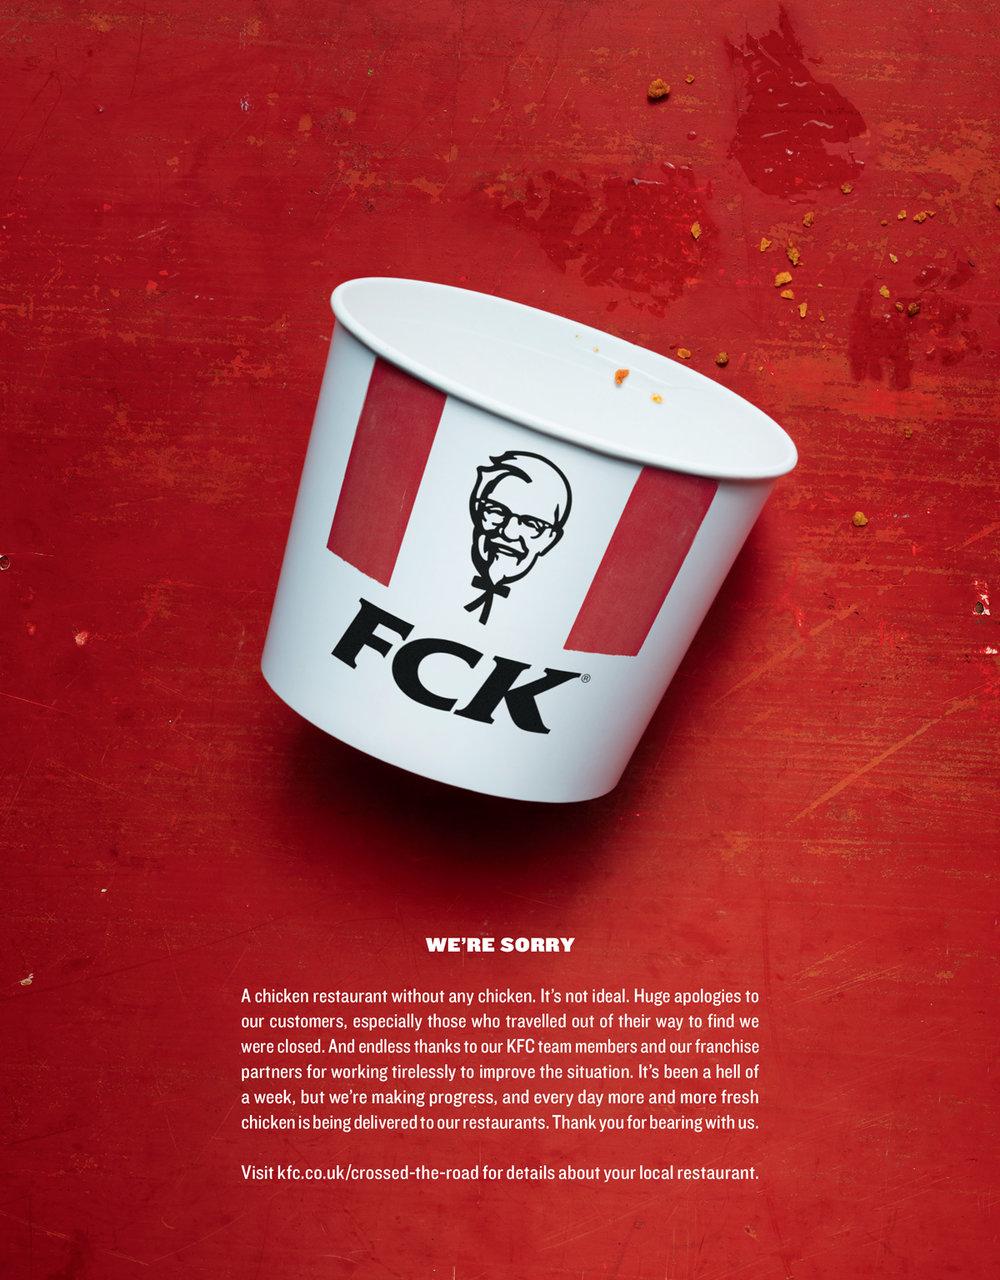 KFC_ApologyAd18.jpg